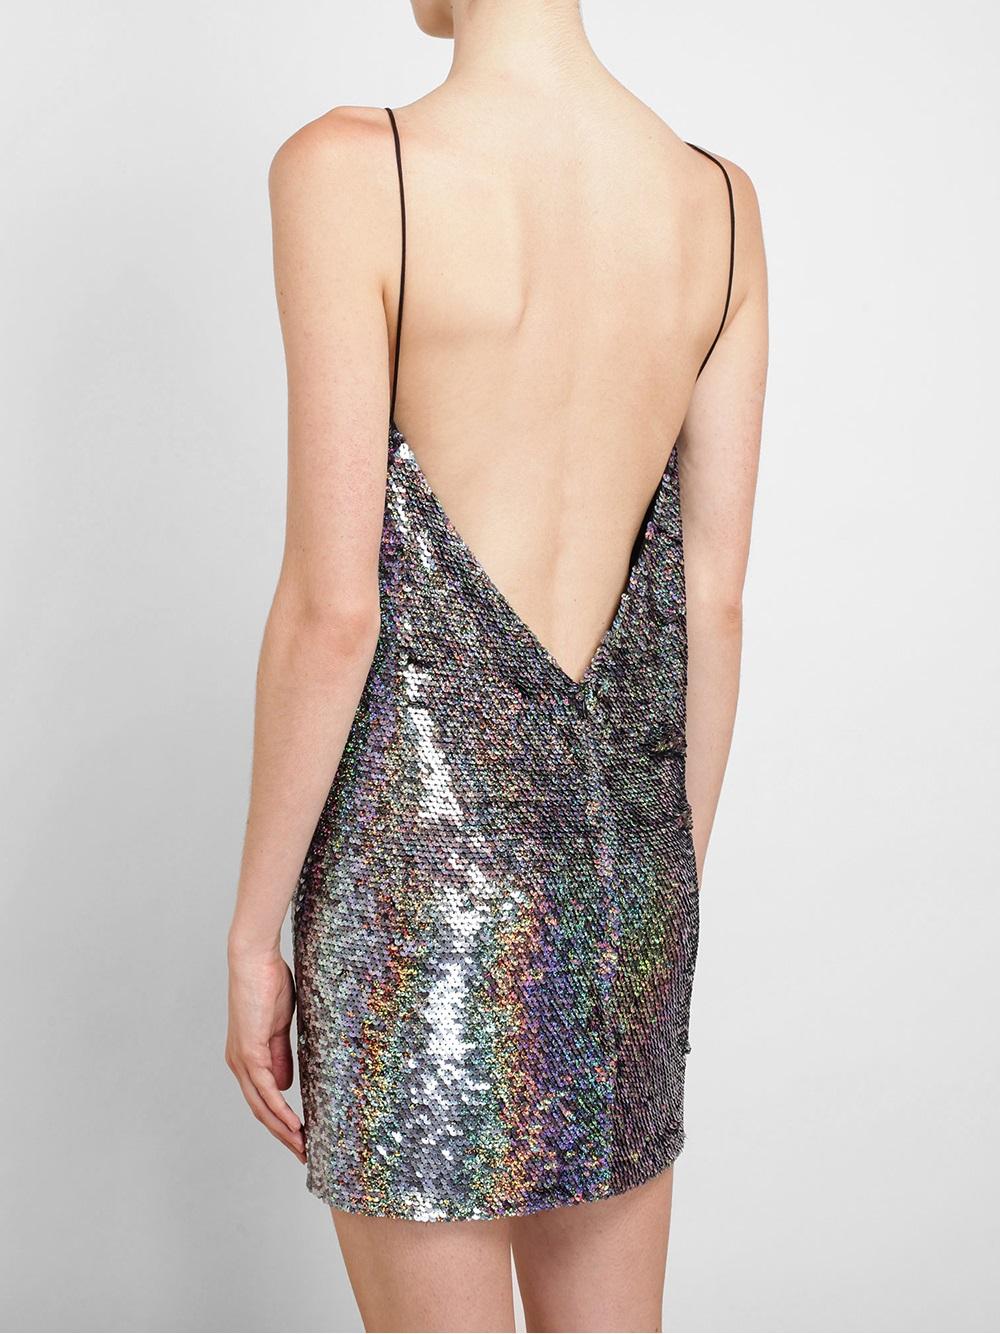 Ashish Holographic Sequin Slip Dress in Metallic - Lyst